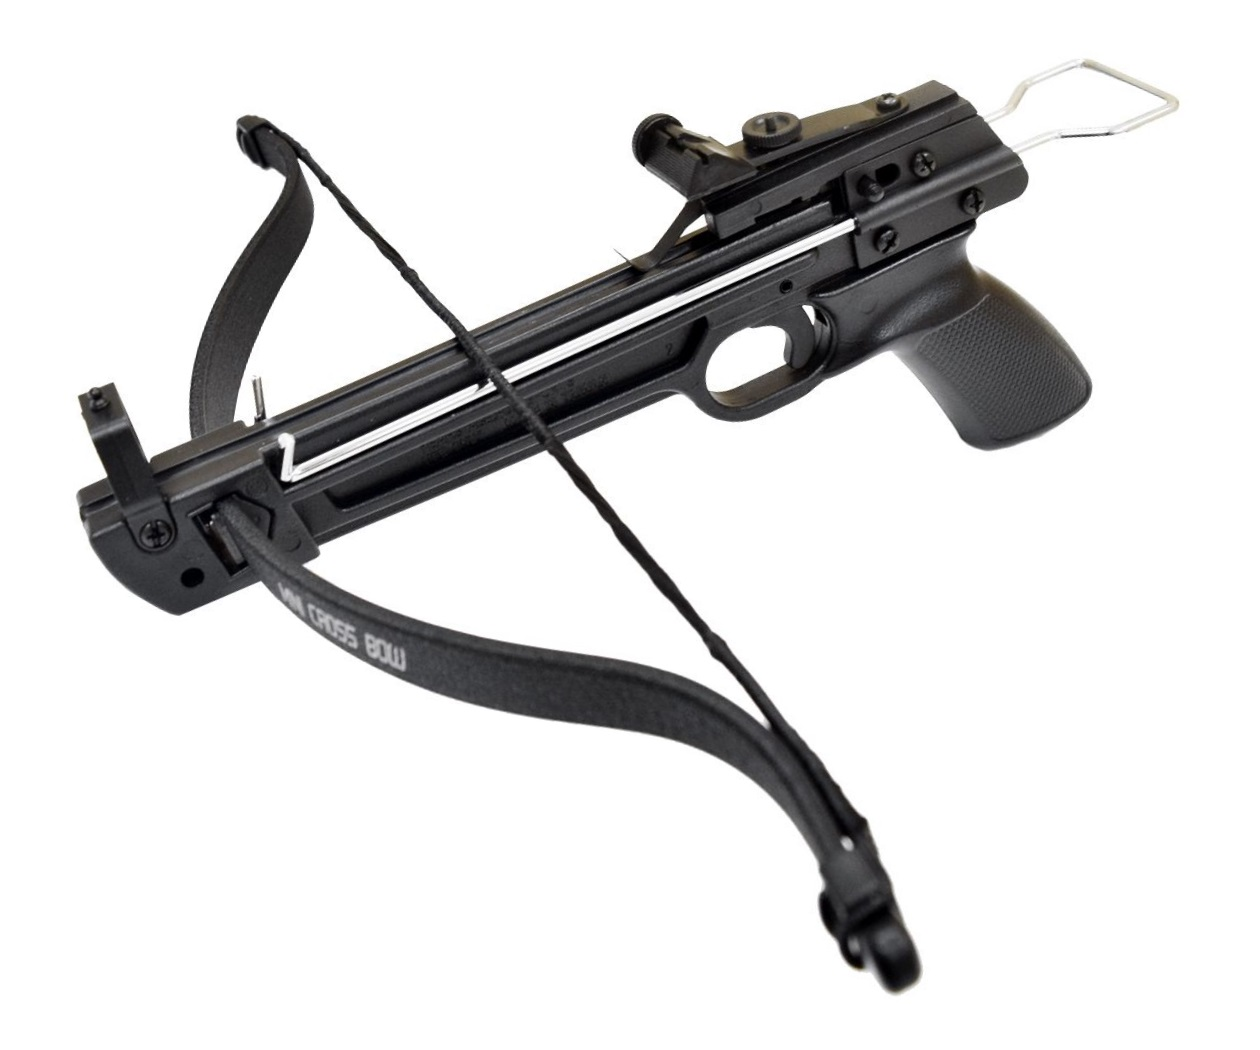 Арбалет-пистолет Man Kung MK-80A1 Wasp (пластик, стремя)